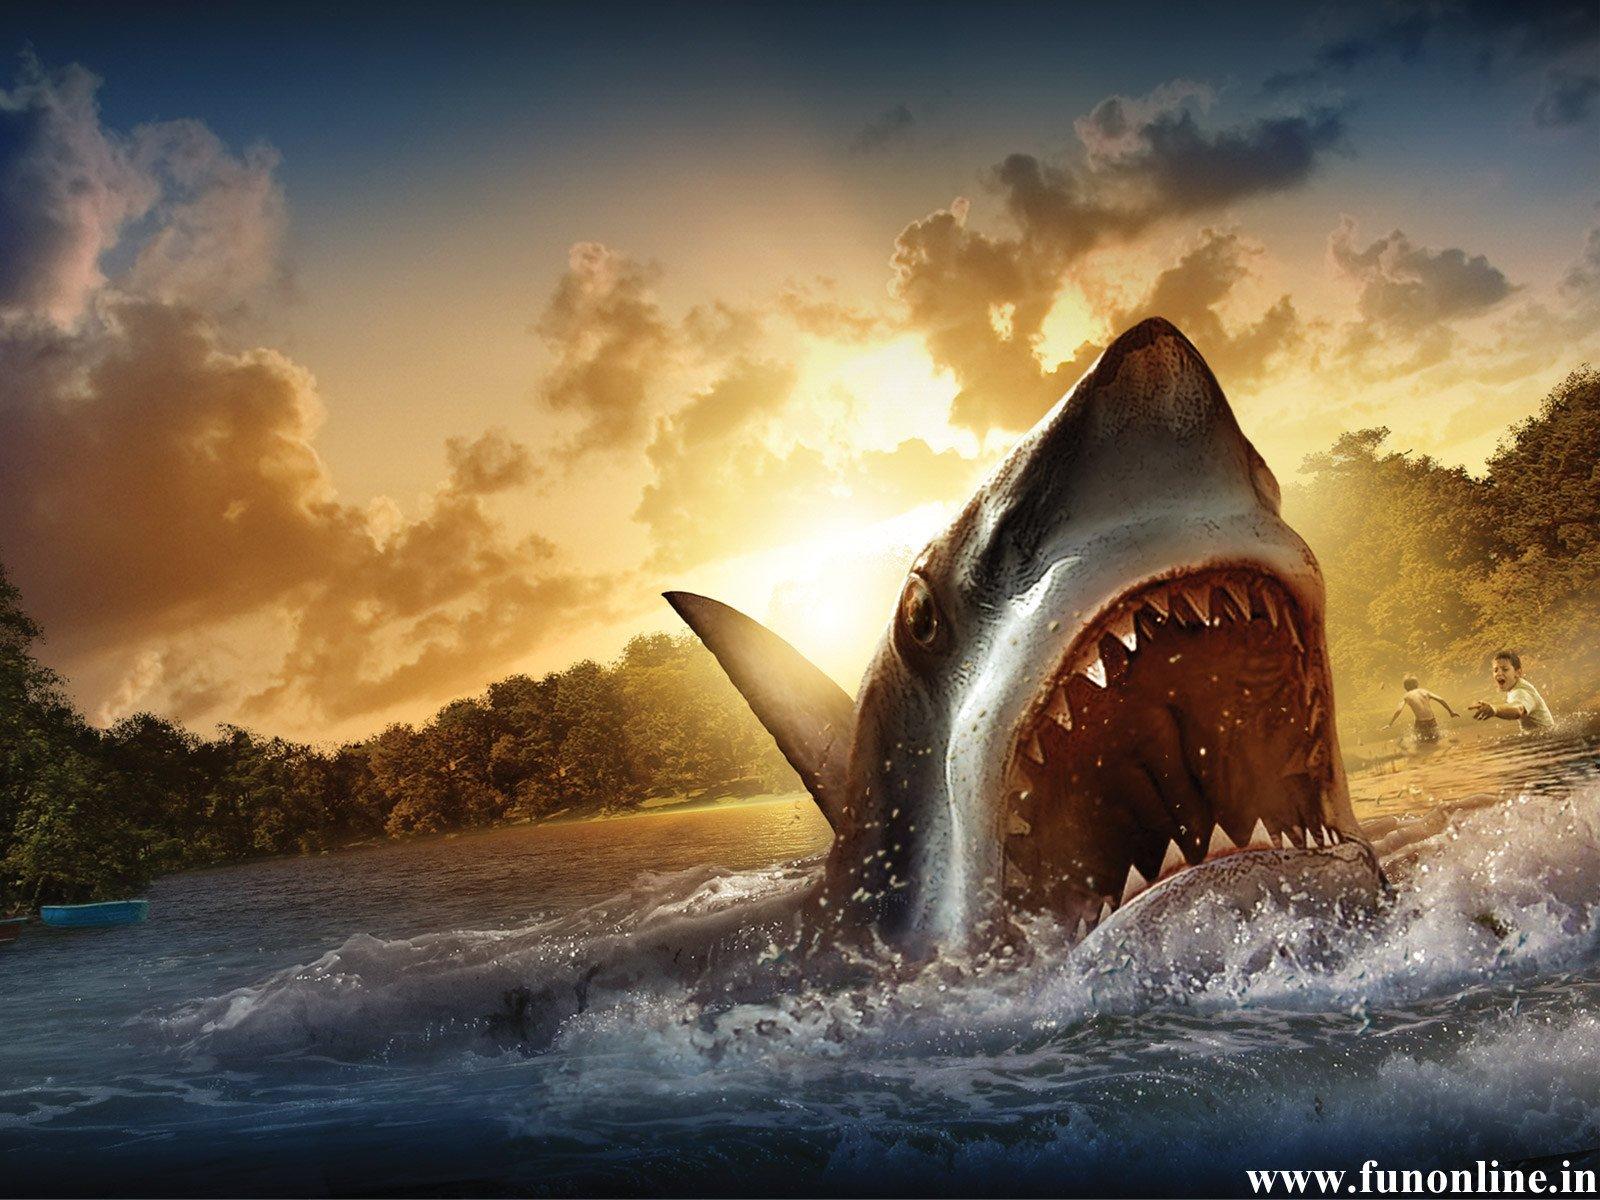 50] Moving Shark Wallpaper on WallpaperSafari 1600x1200